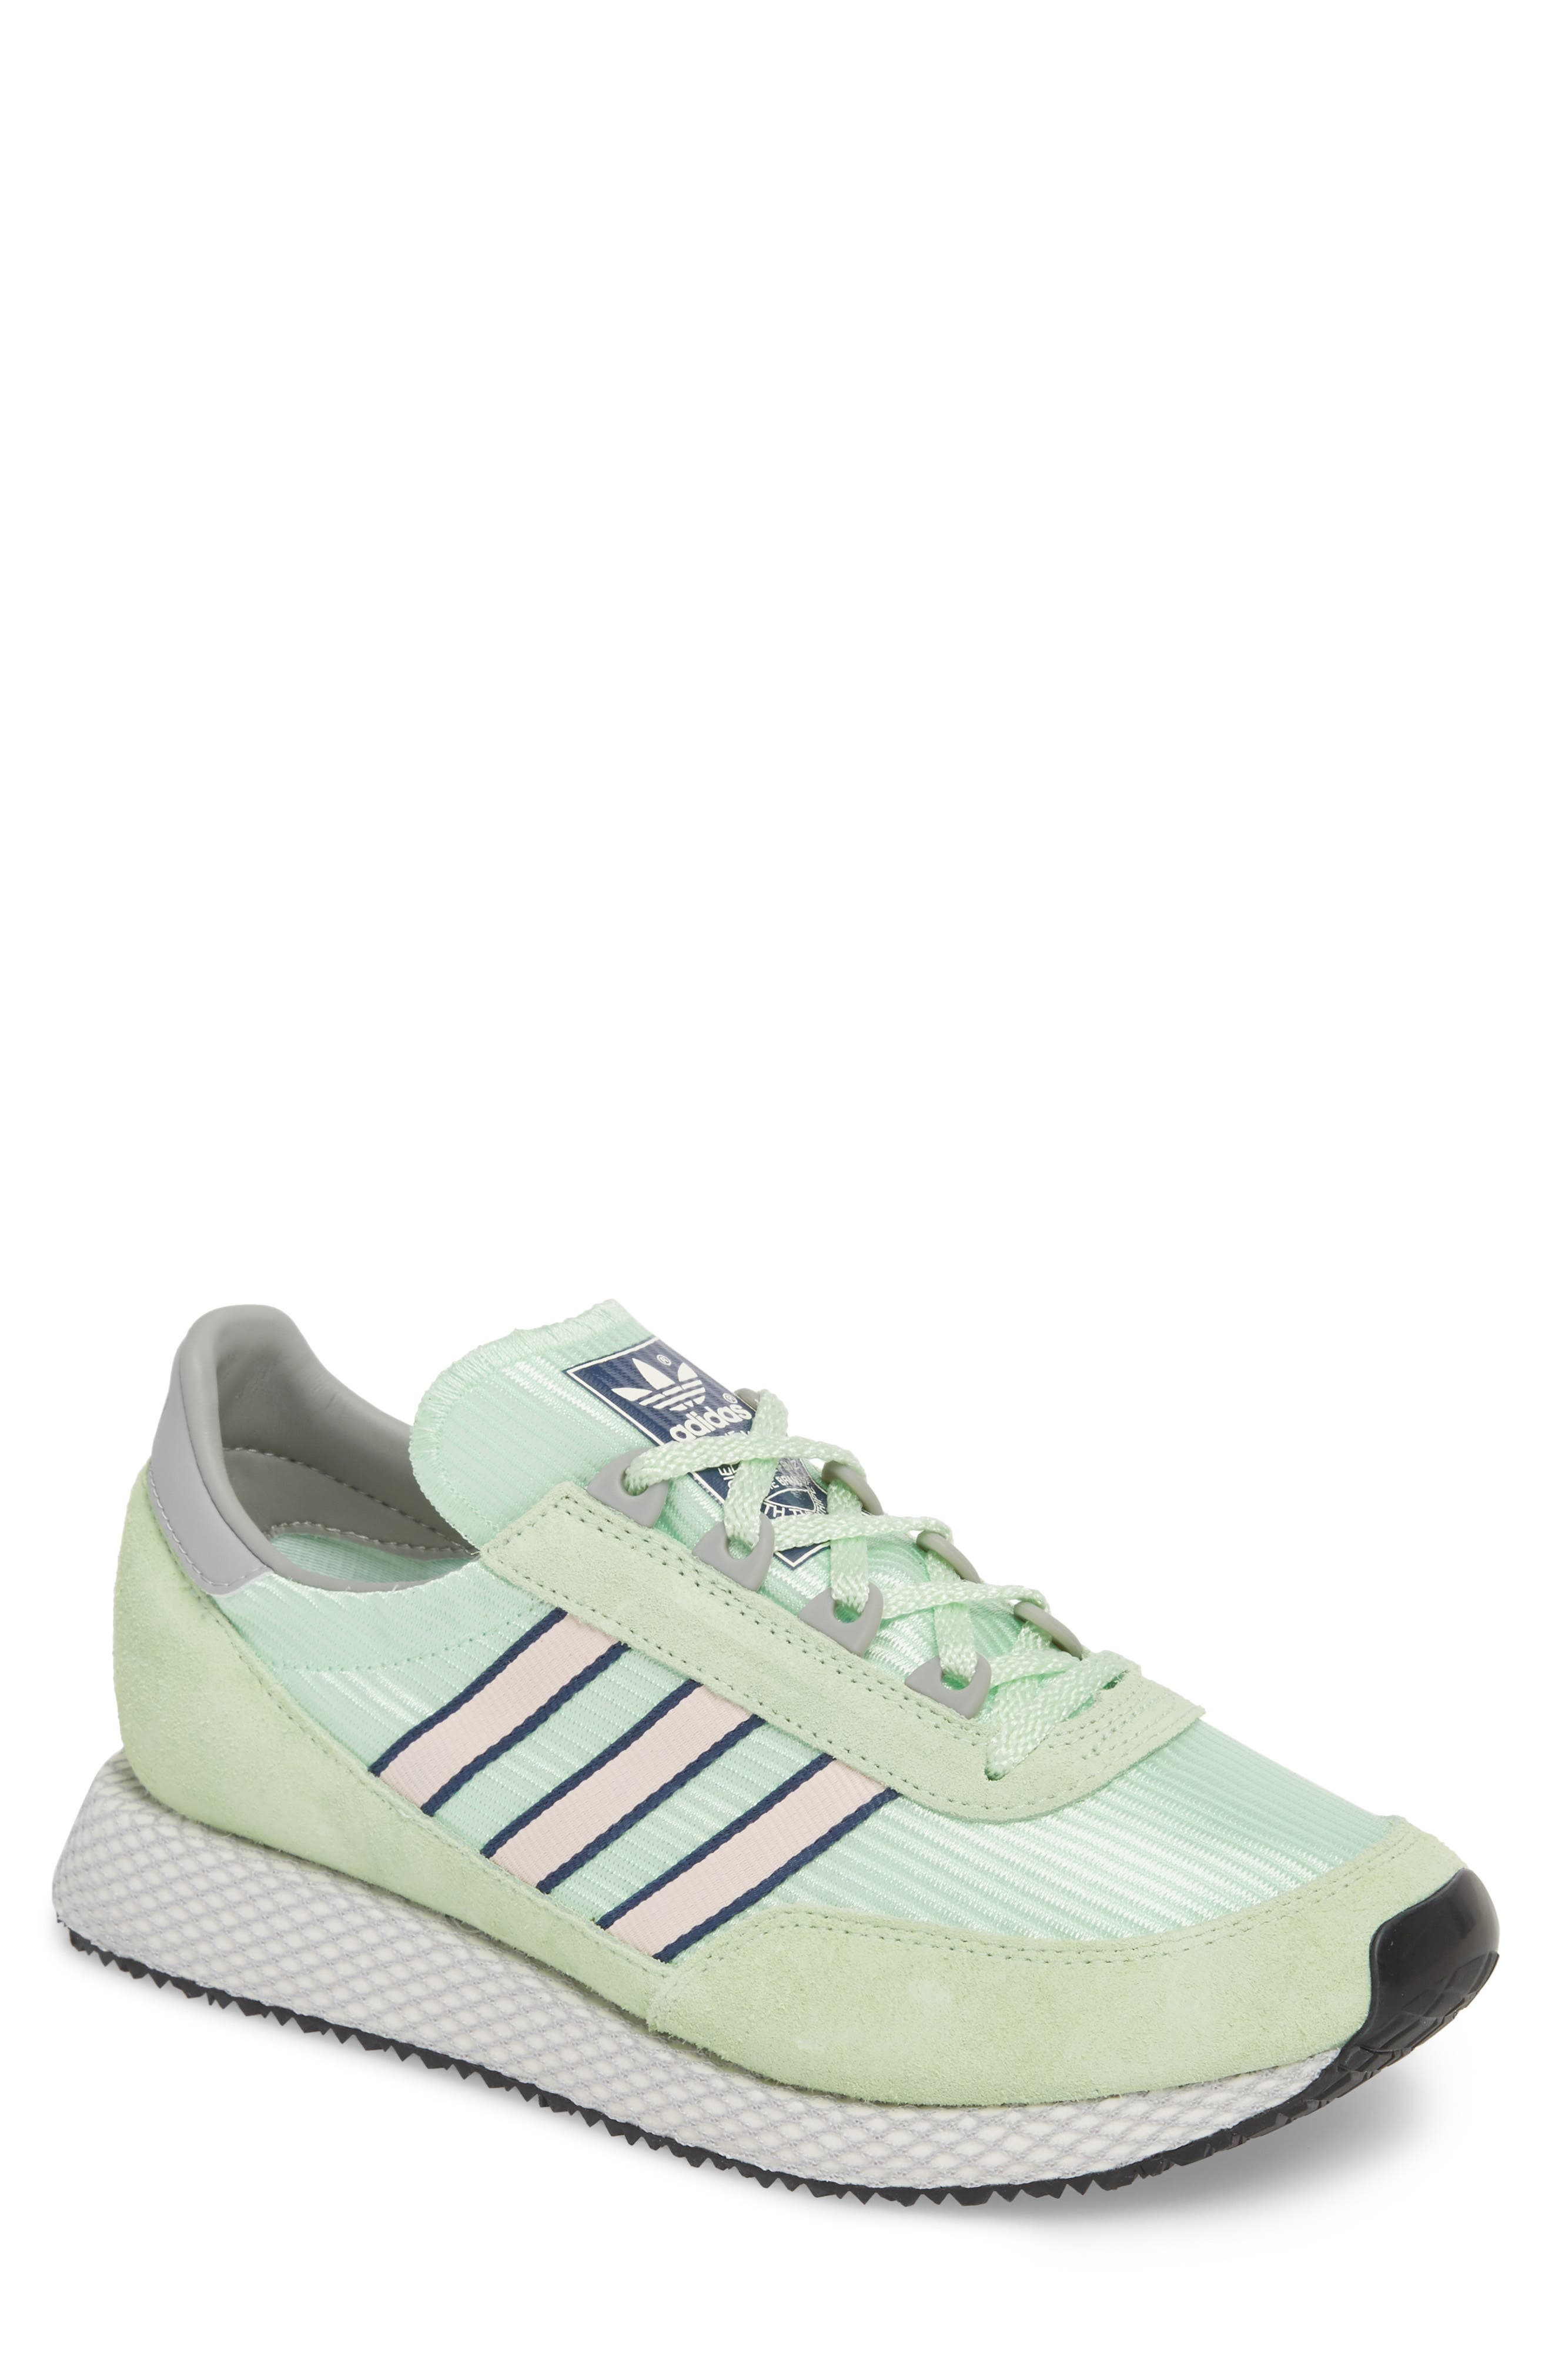 Glenbuck SPZL Sneaker,                         Main,                         color, GREEN